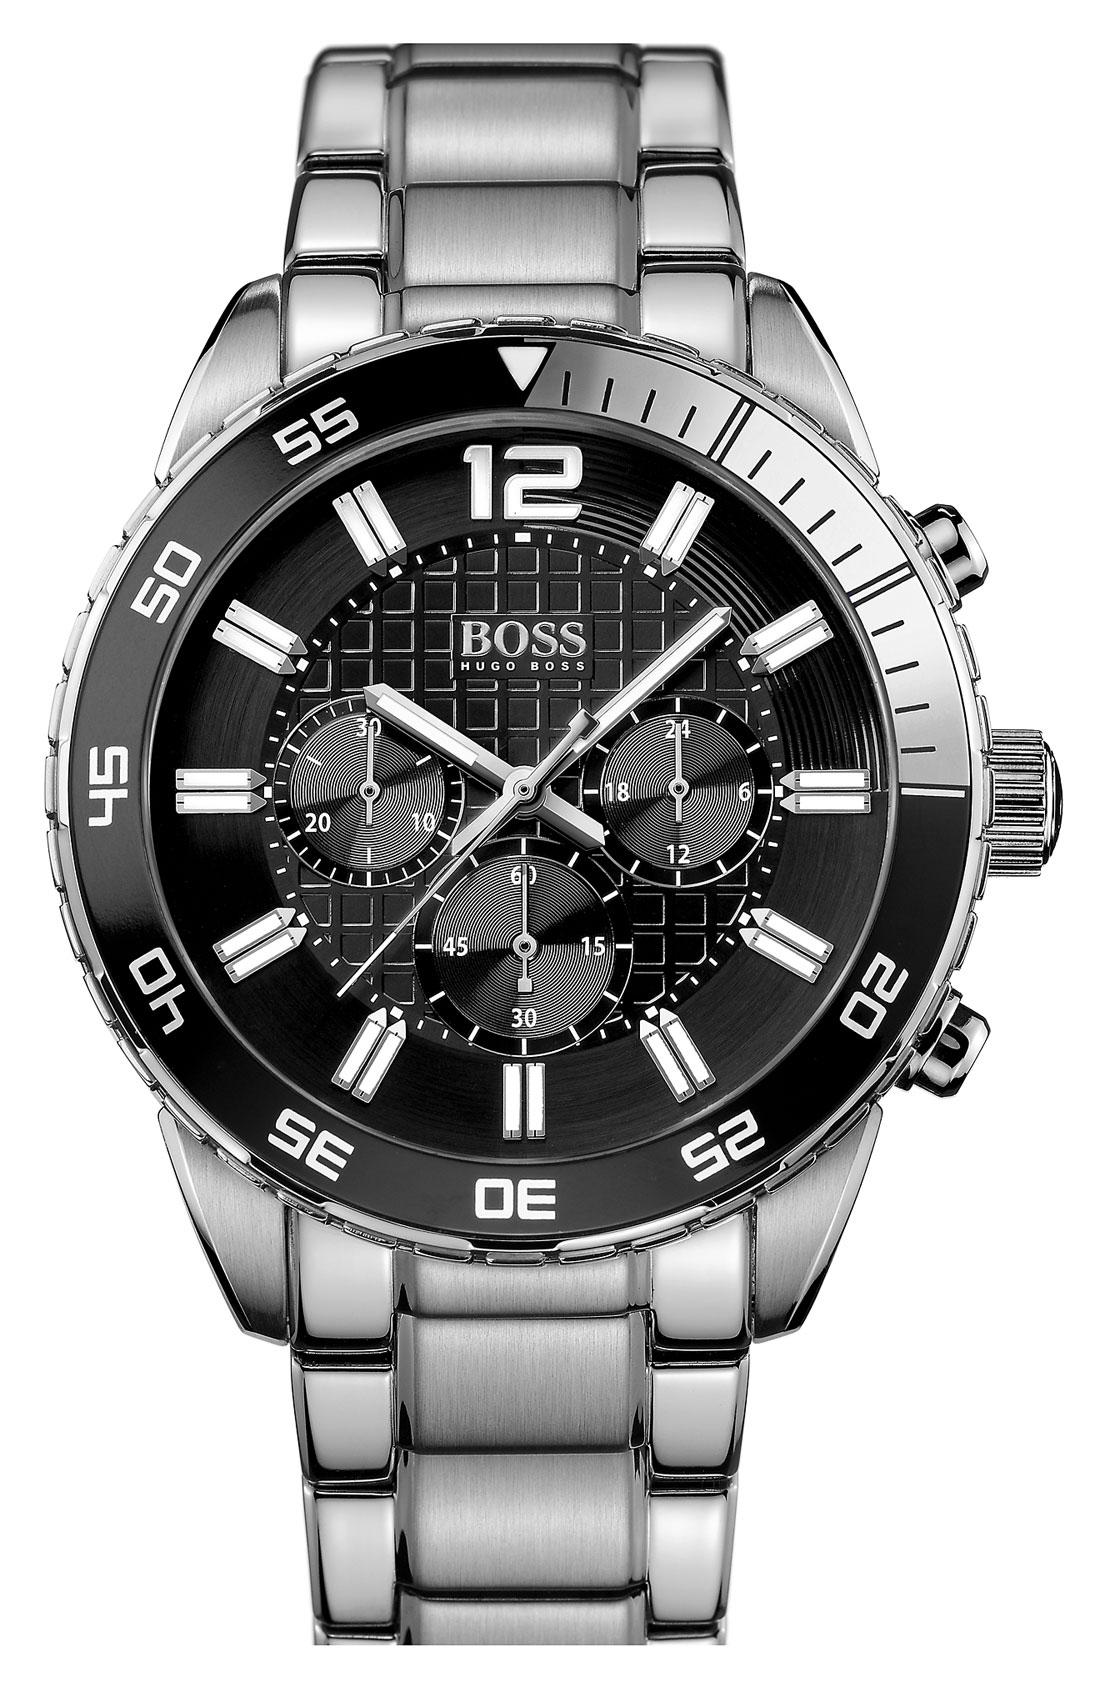 часы boss мужские официальный сайт